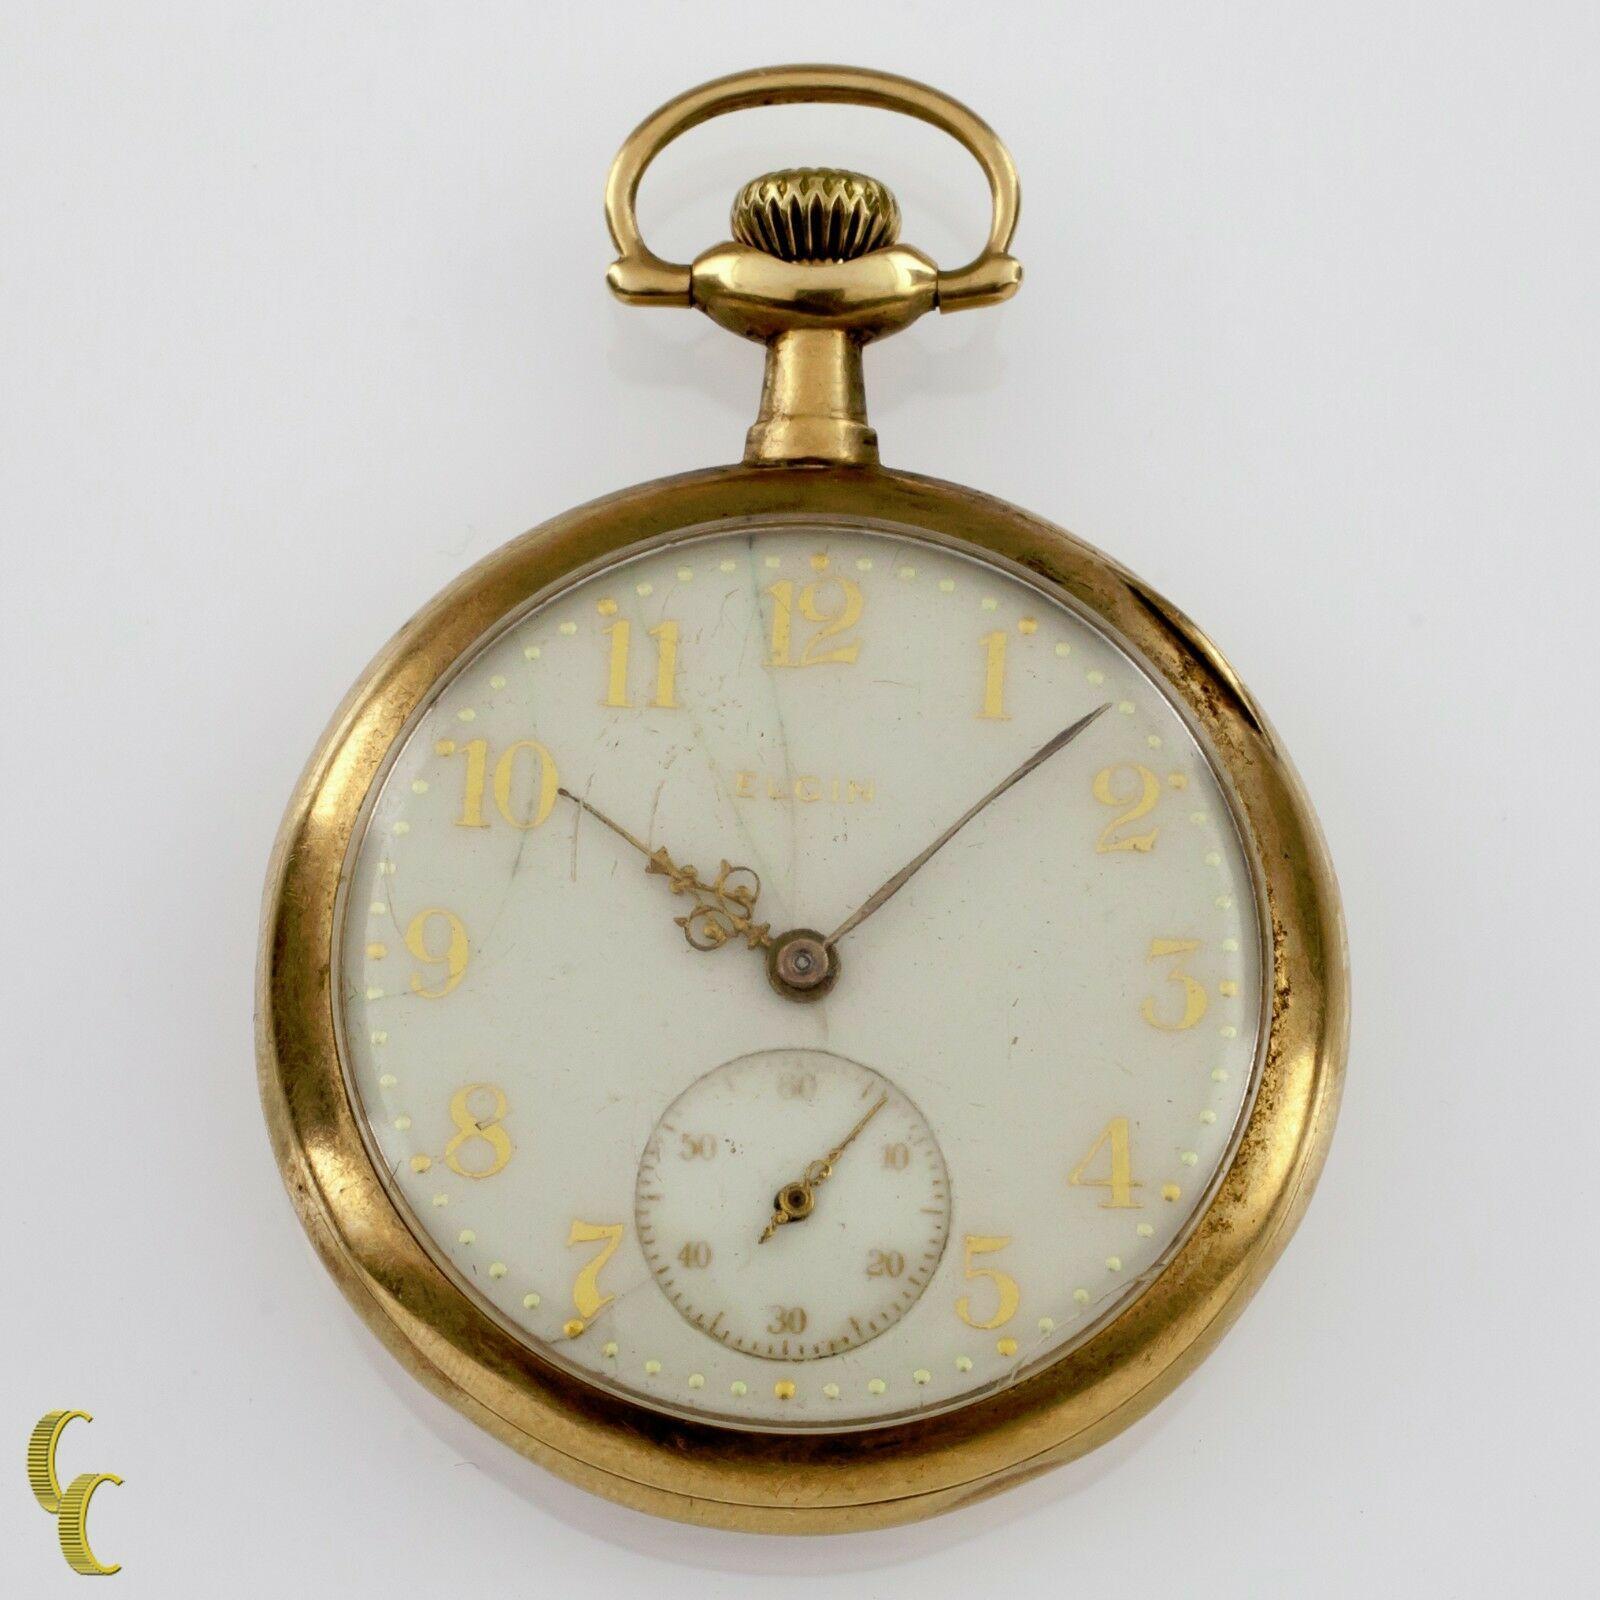 Elgin Open Face 14k Yellow Gold Pocket Watch 15 Jewel Size 12 Grade 315 - $1,247.21